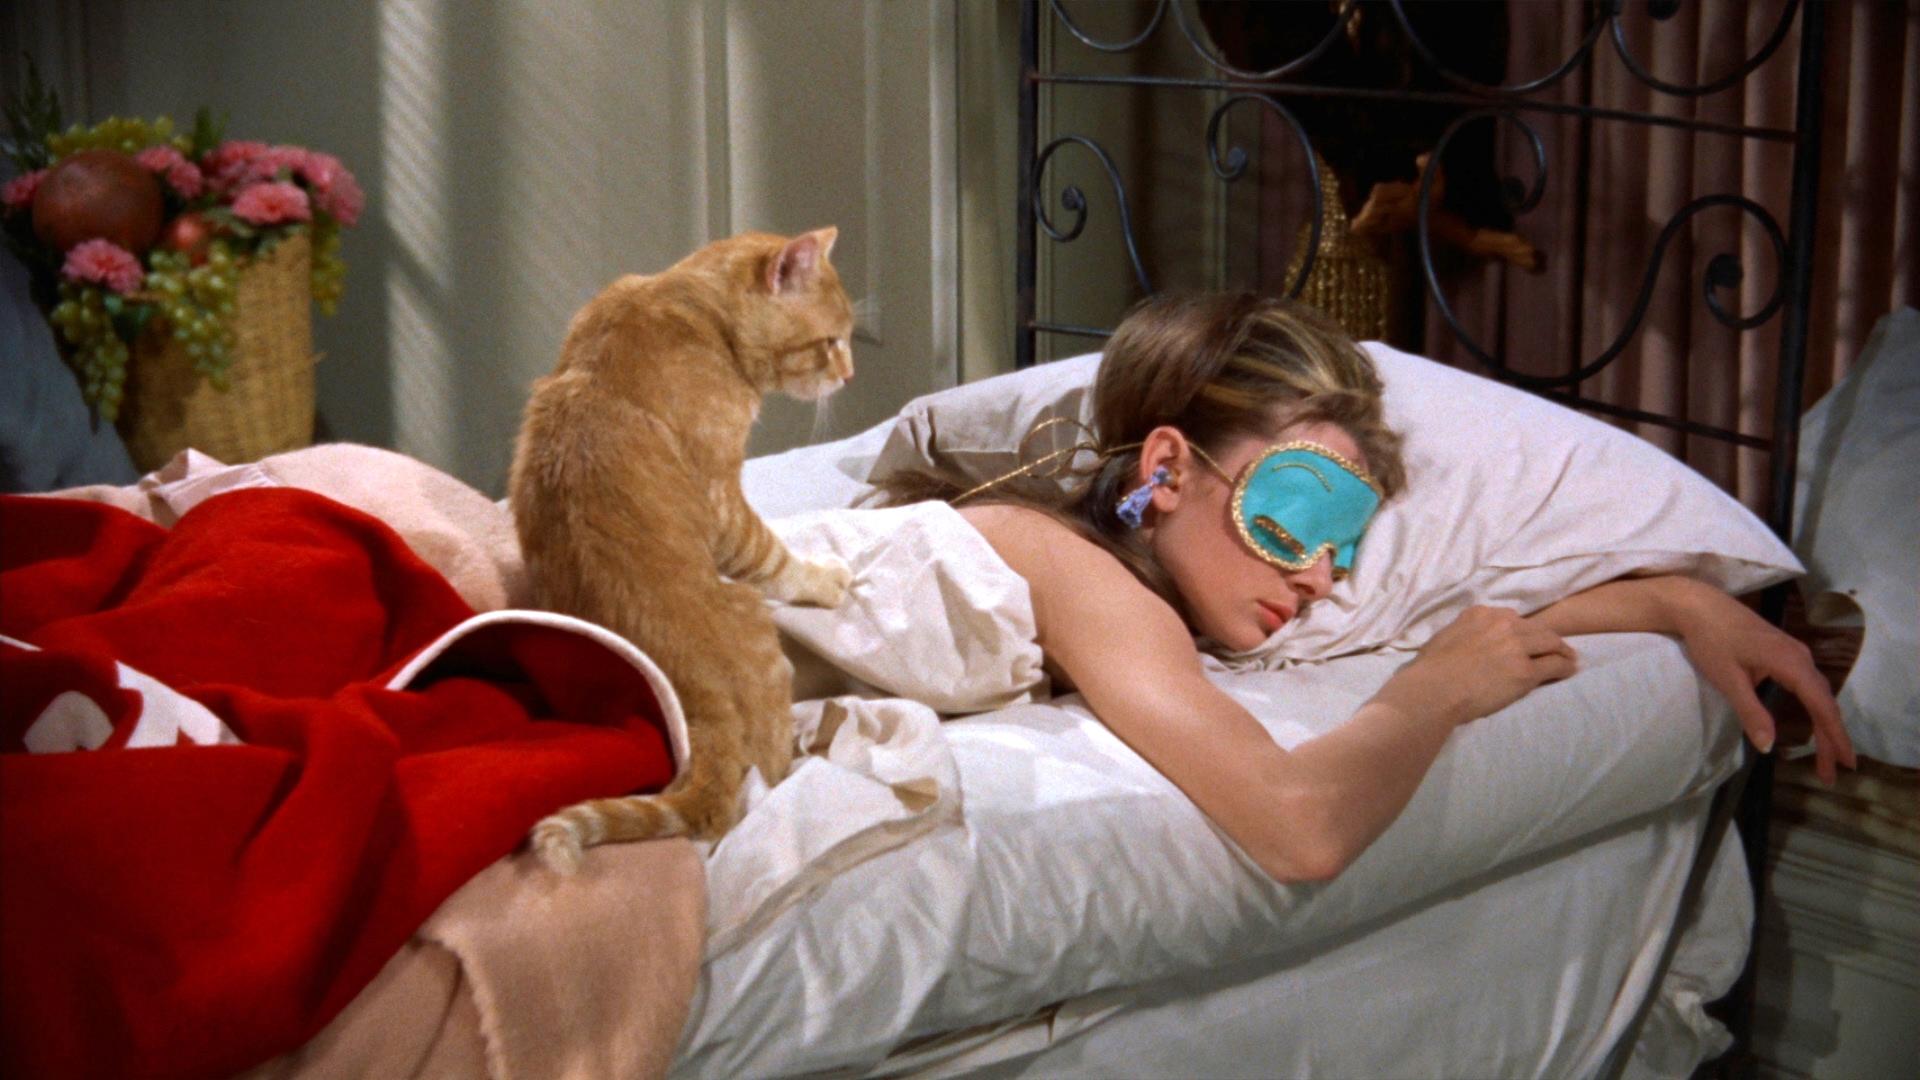 sleep aids music sounds asmr binaural meditation ekhart yoga esther teule sleep pillow rain rain audio help best